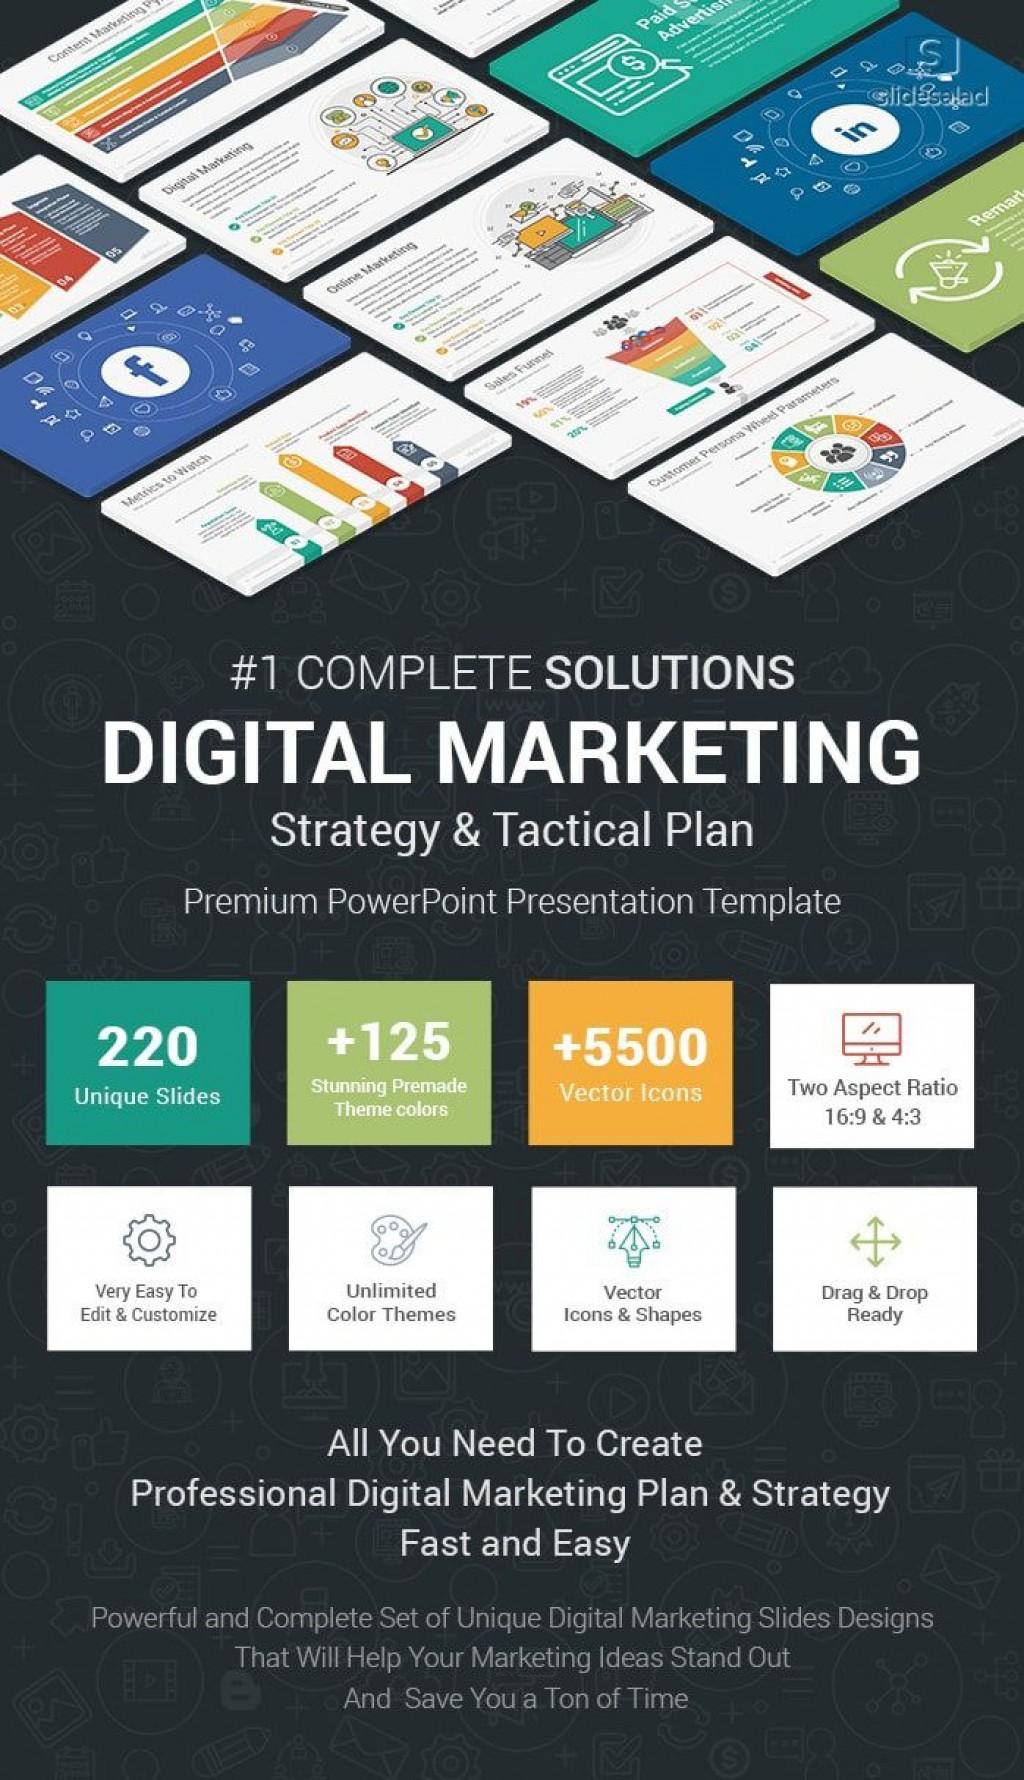 005 Wondrou Digital Marketing Plan Ppt Presentation Concept Large